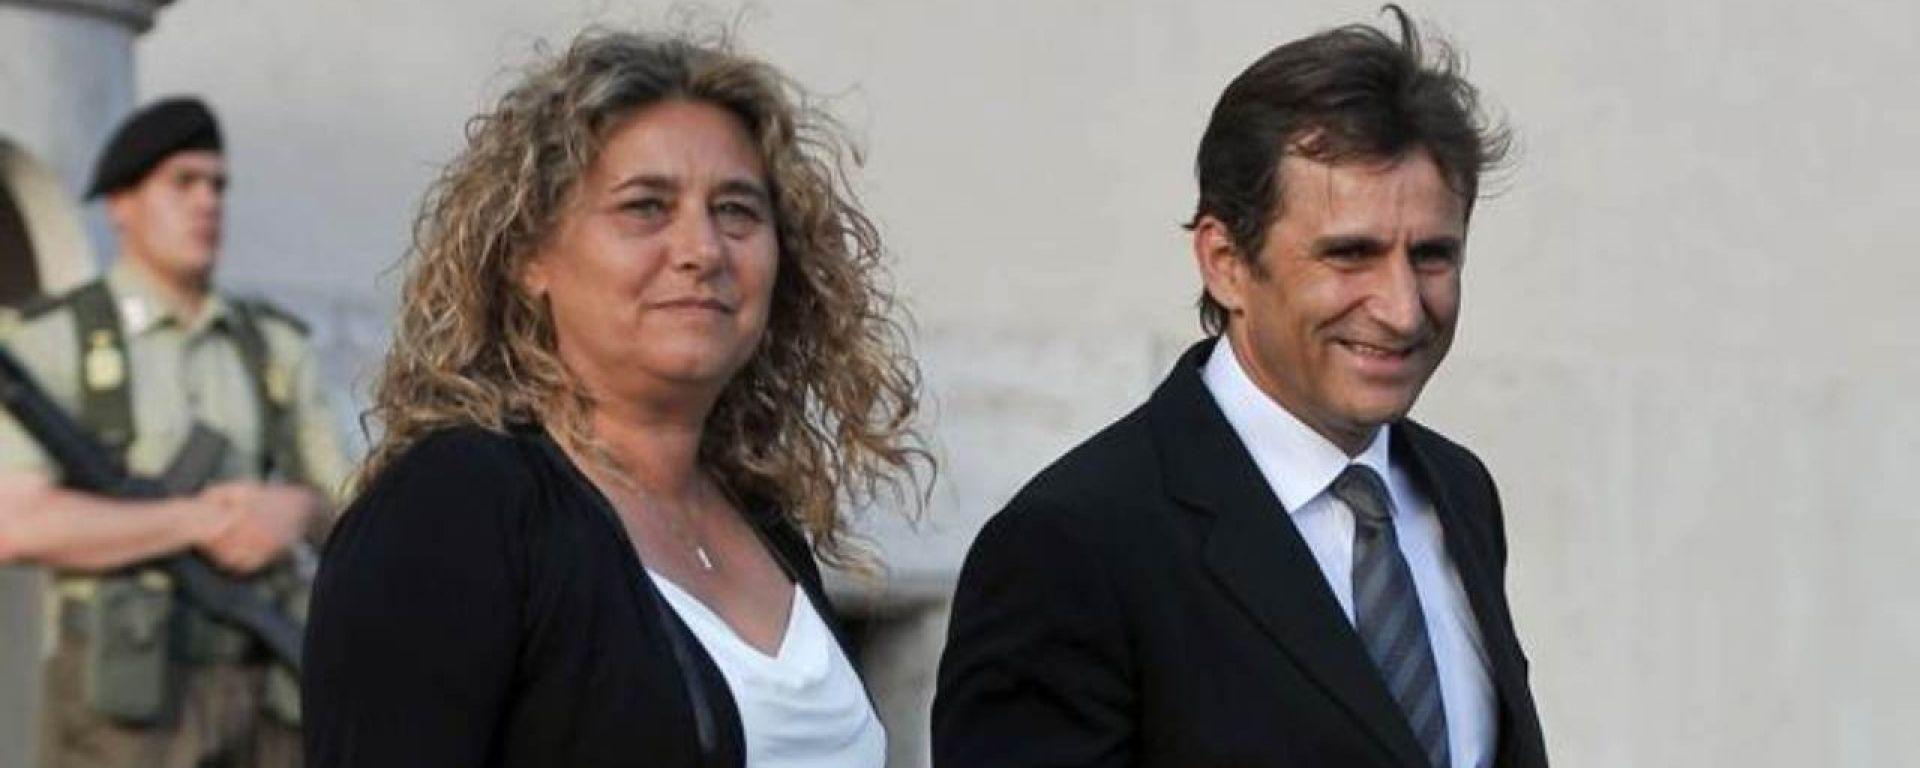 Alex Zanardi e la moglie Daniela